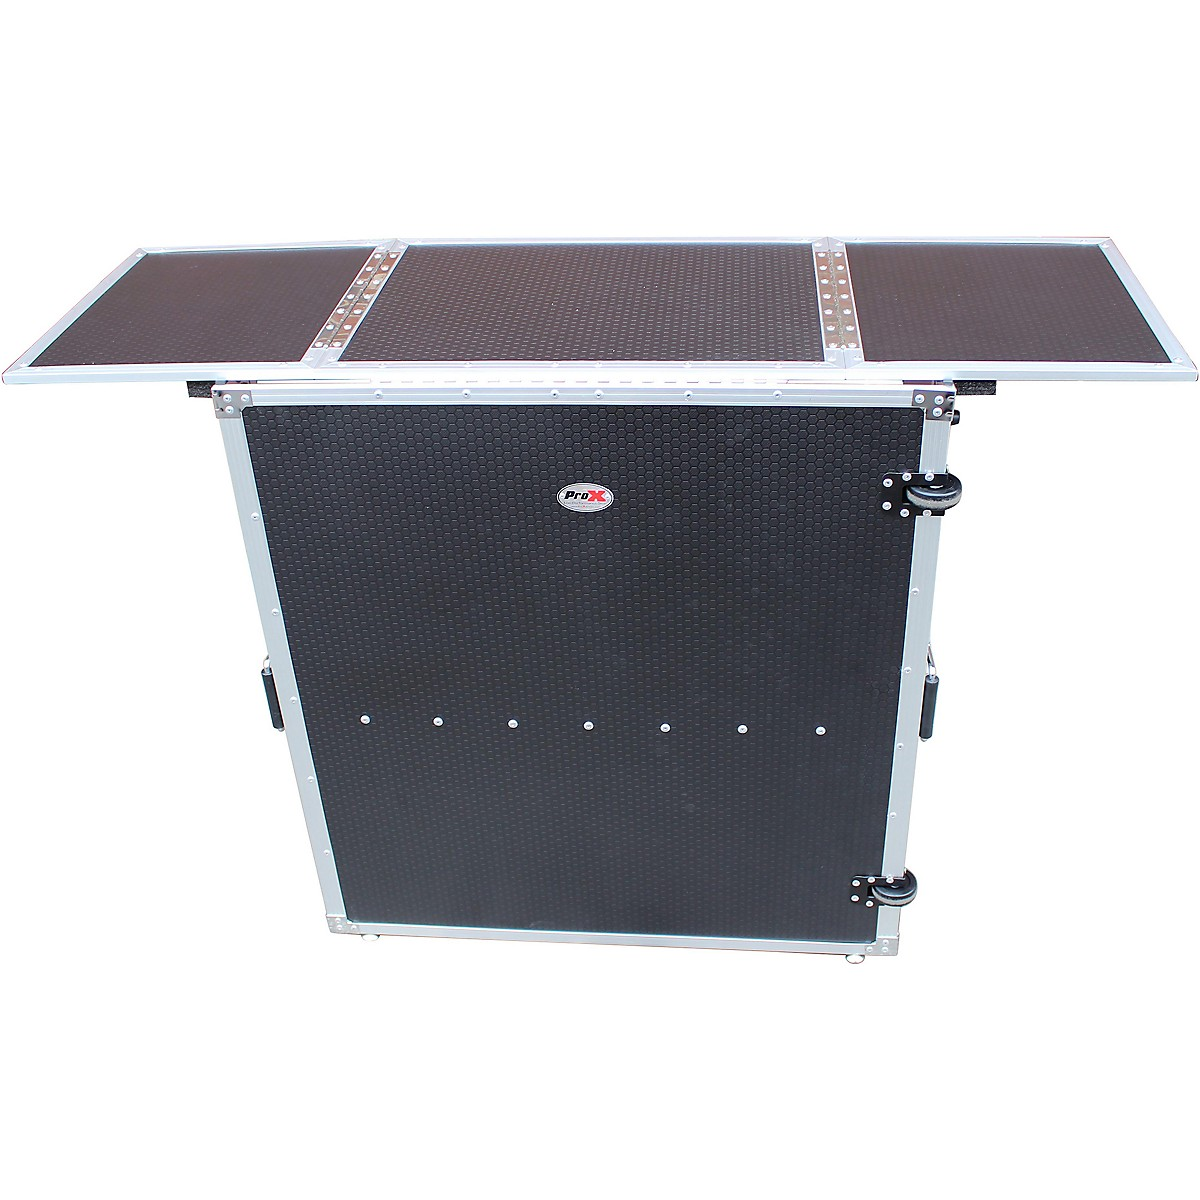 ProX Transformer Series Fold Away DJ Performance Desk Facade Black/Black with Wheels